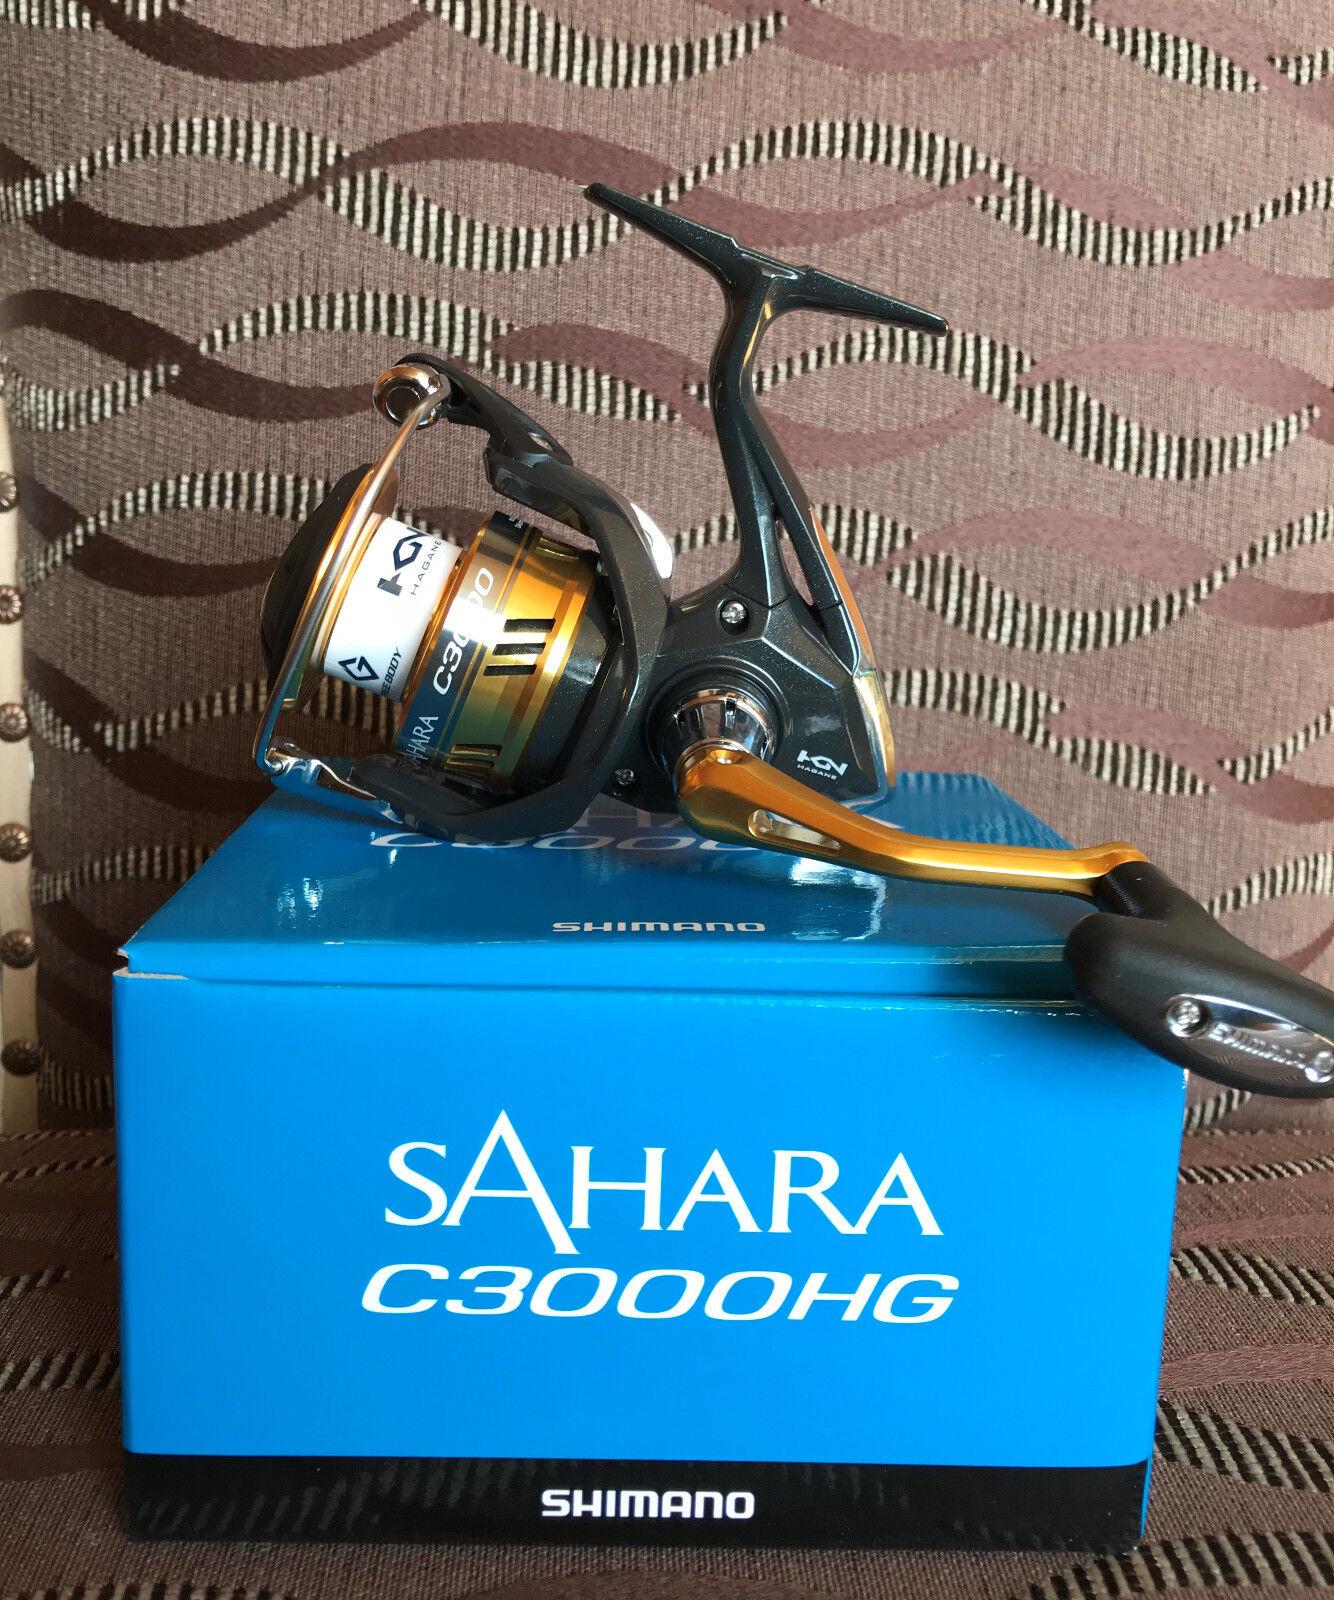 Shimano Sahara c3000hg fi spinnrolle